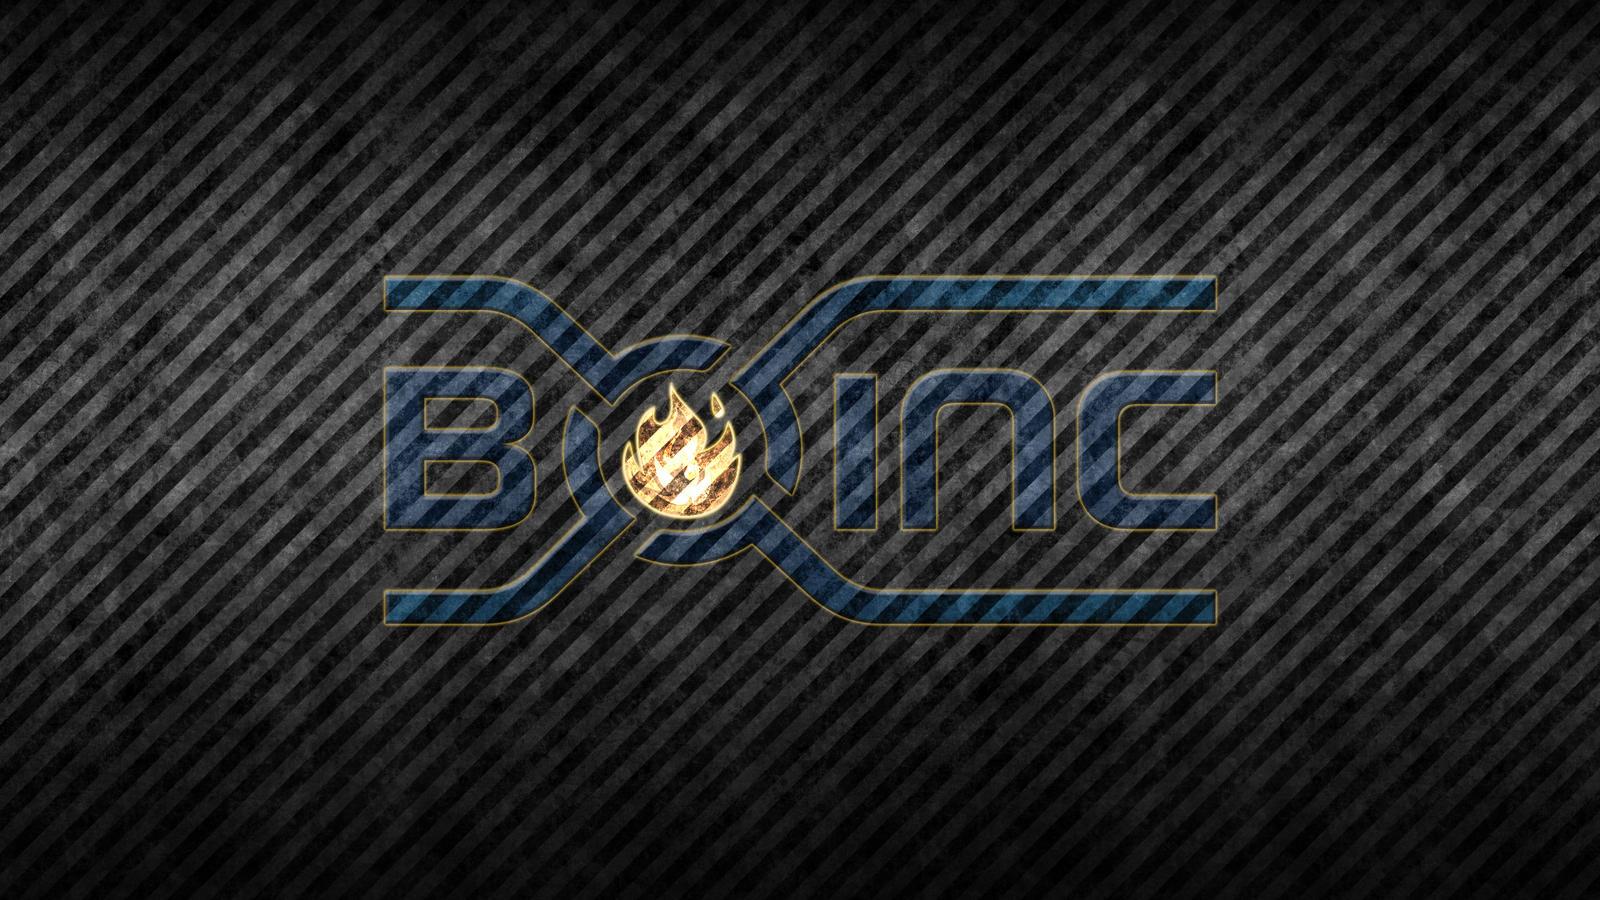 OCN Boinc Wallpaper Graphic   Page 4 1600x900